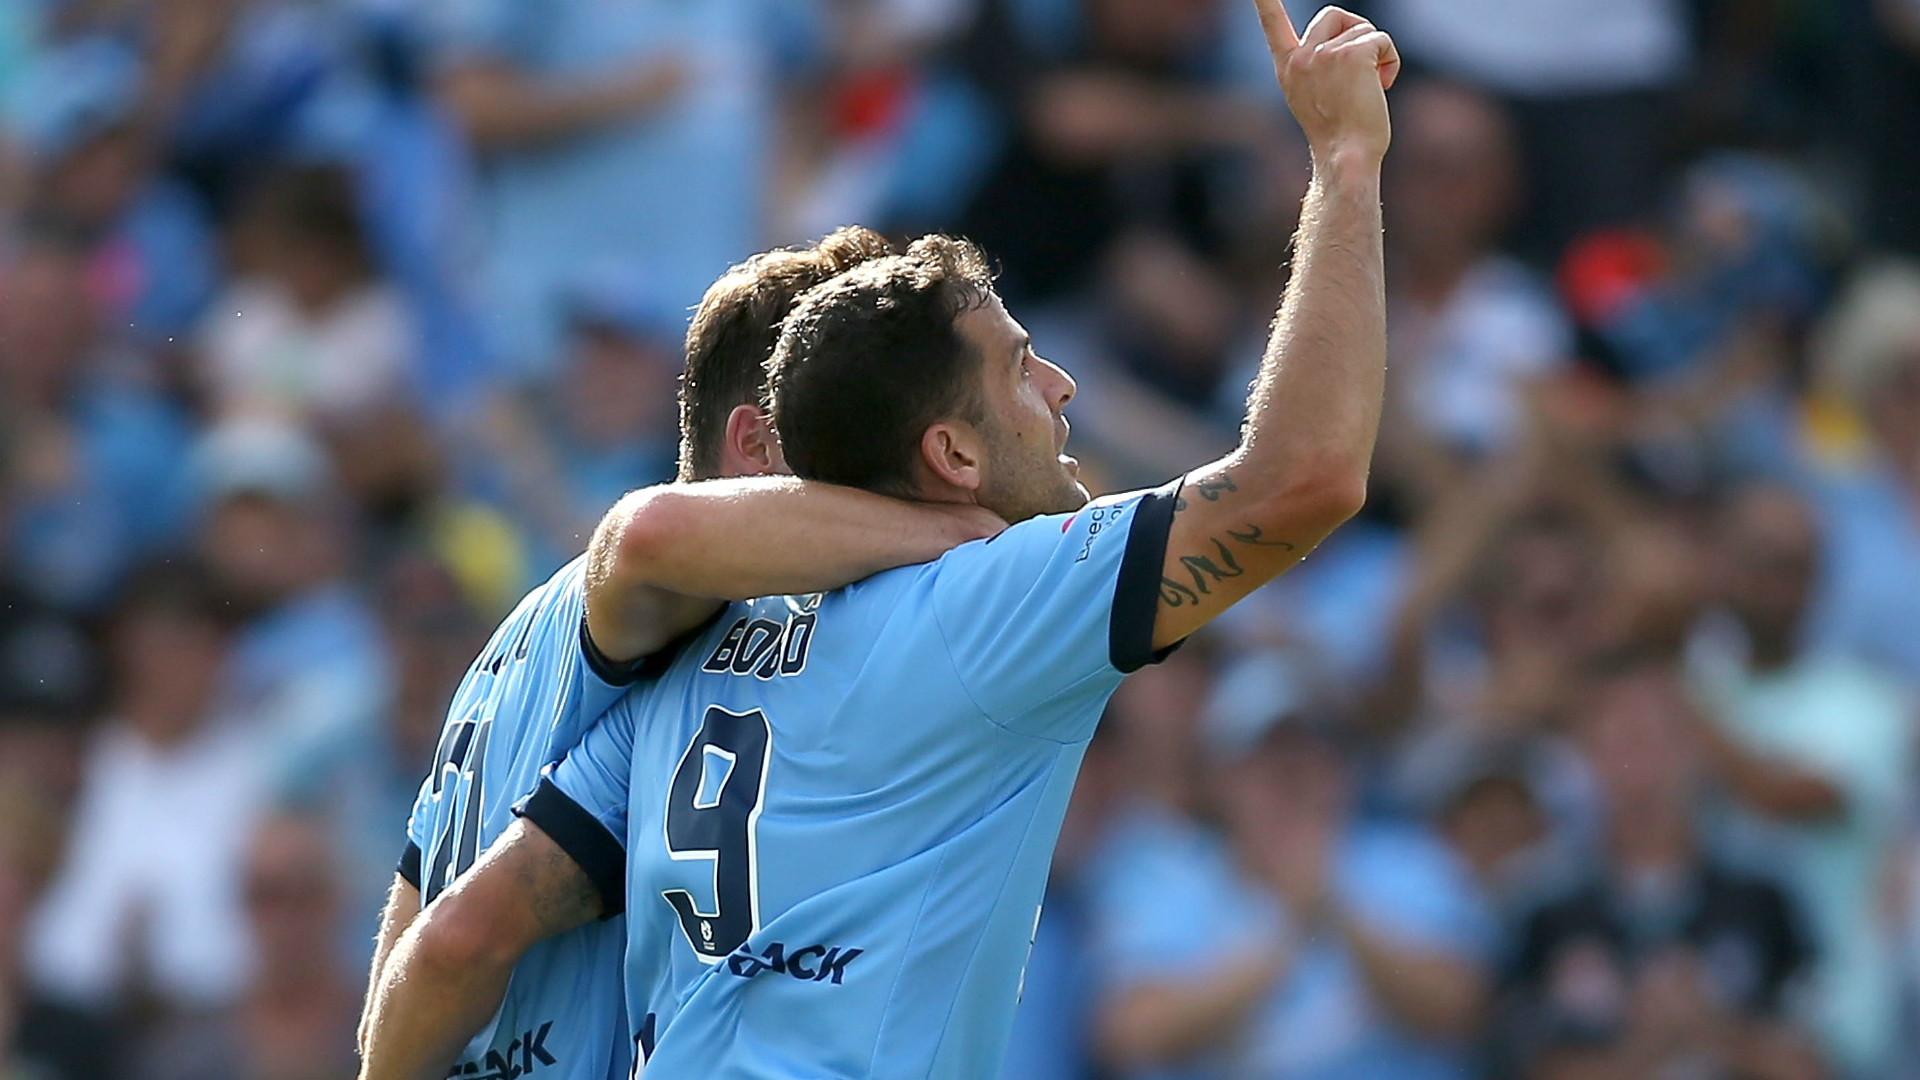 Pressure on Sydney FC, says Glory skipper